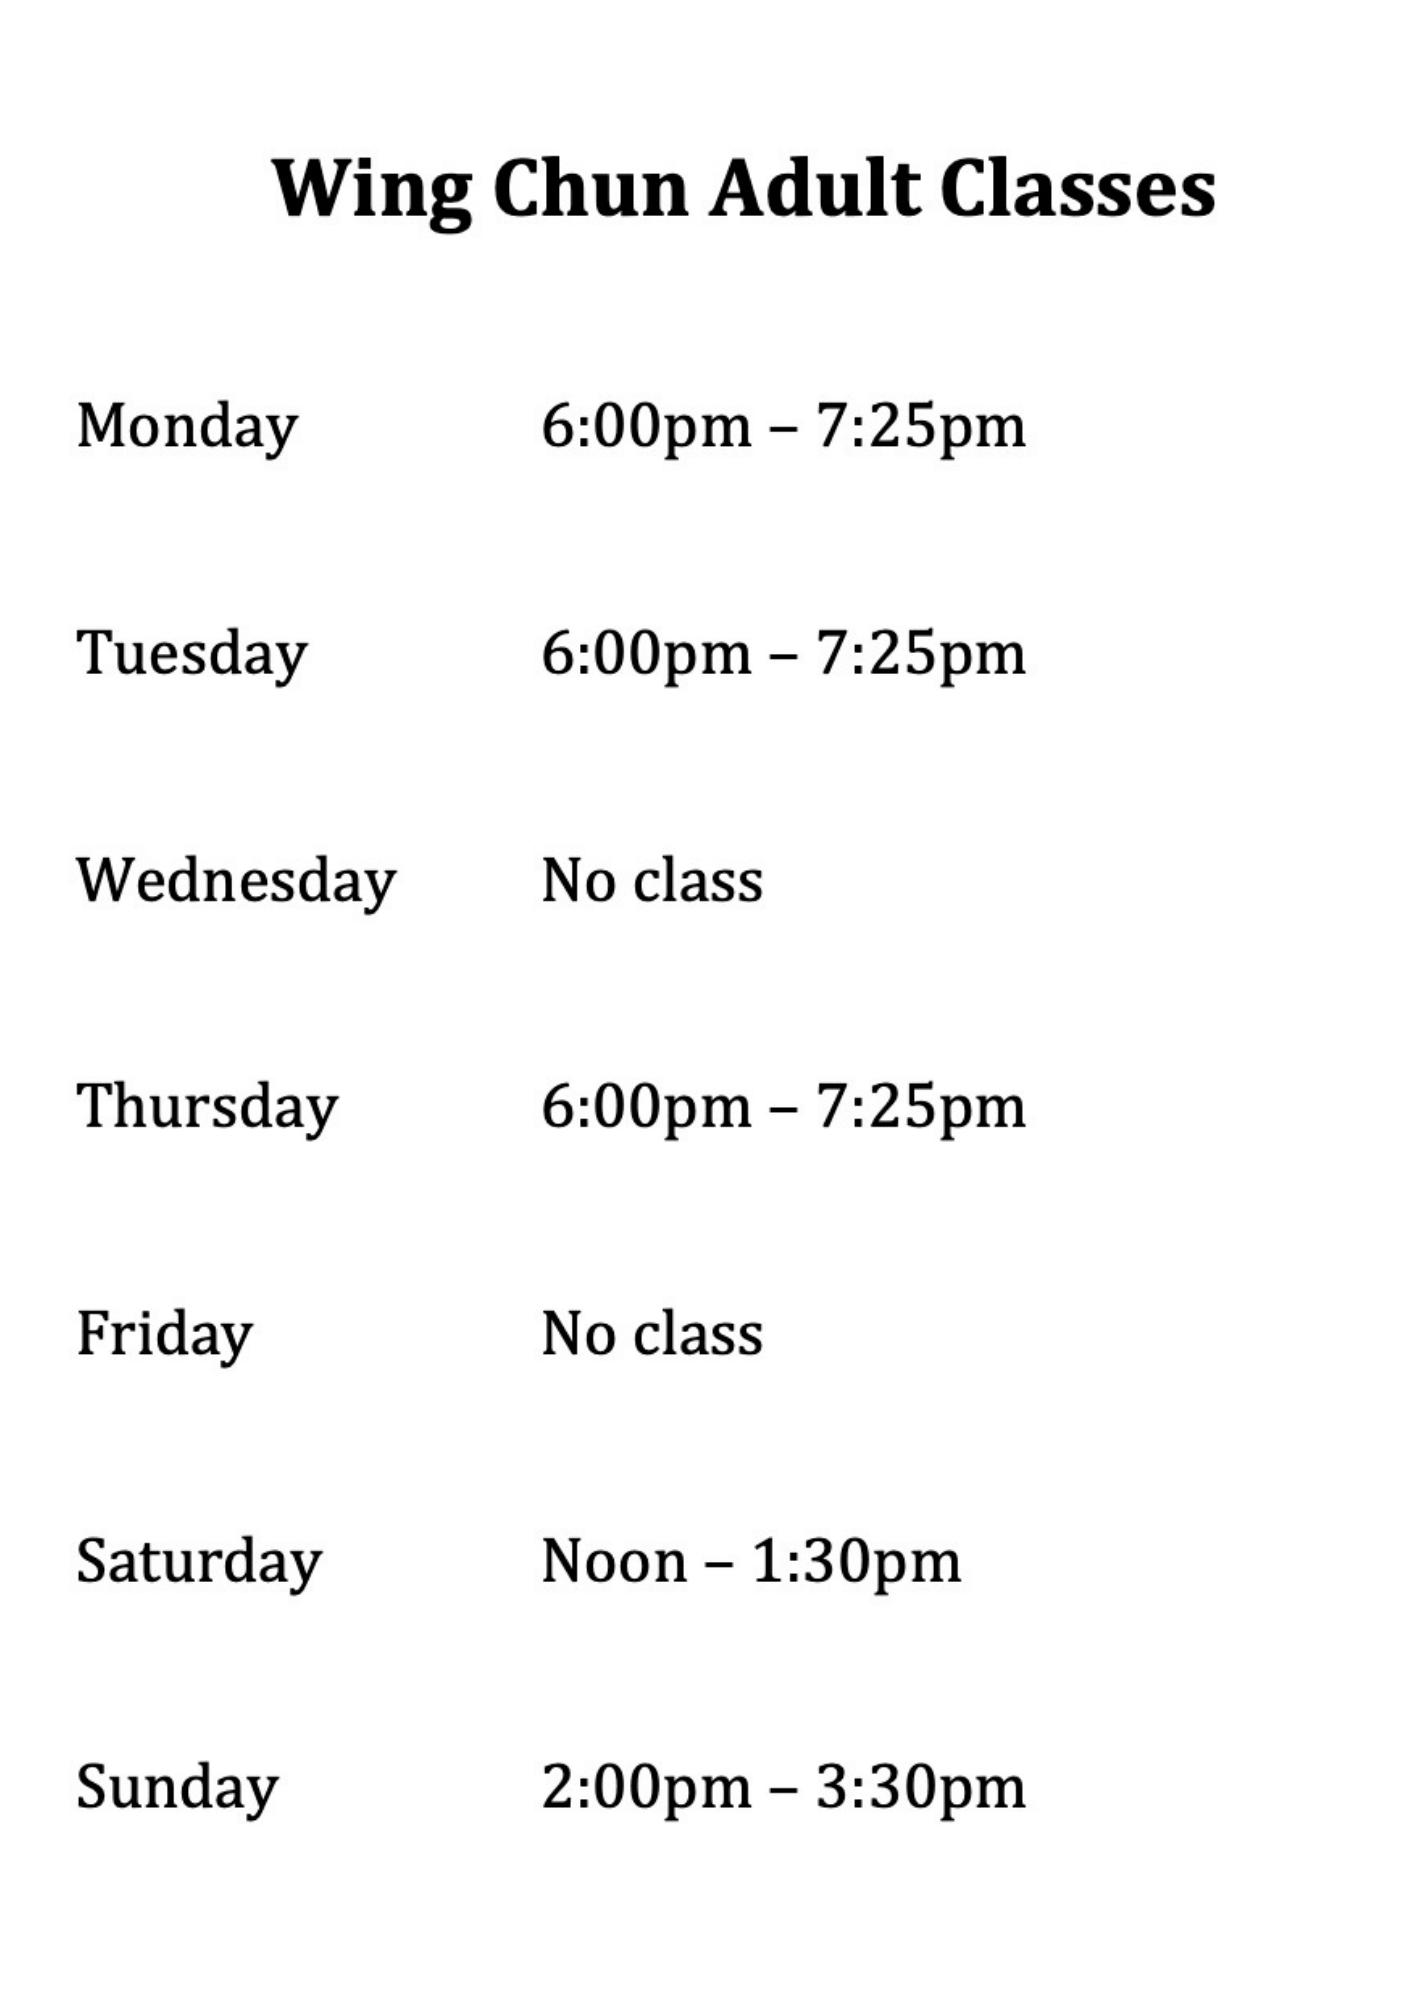 Wing Chun Classes at Wing Chun & Jiu-Jitsu Melbourne - Wing Chun Adult Classes -WingChunclasstimes-1